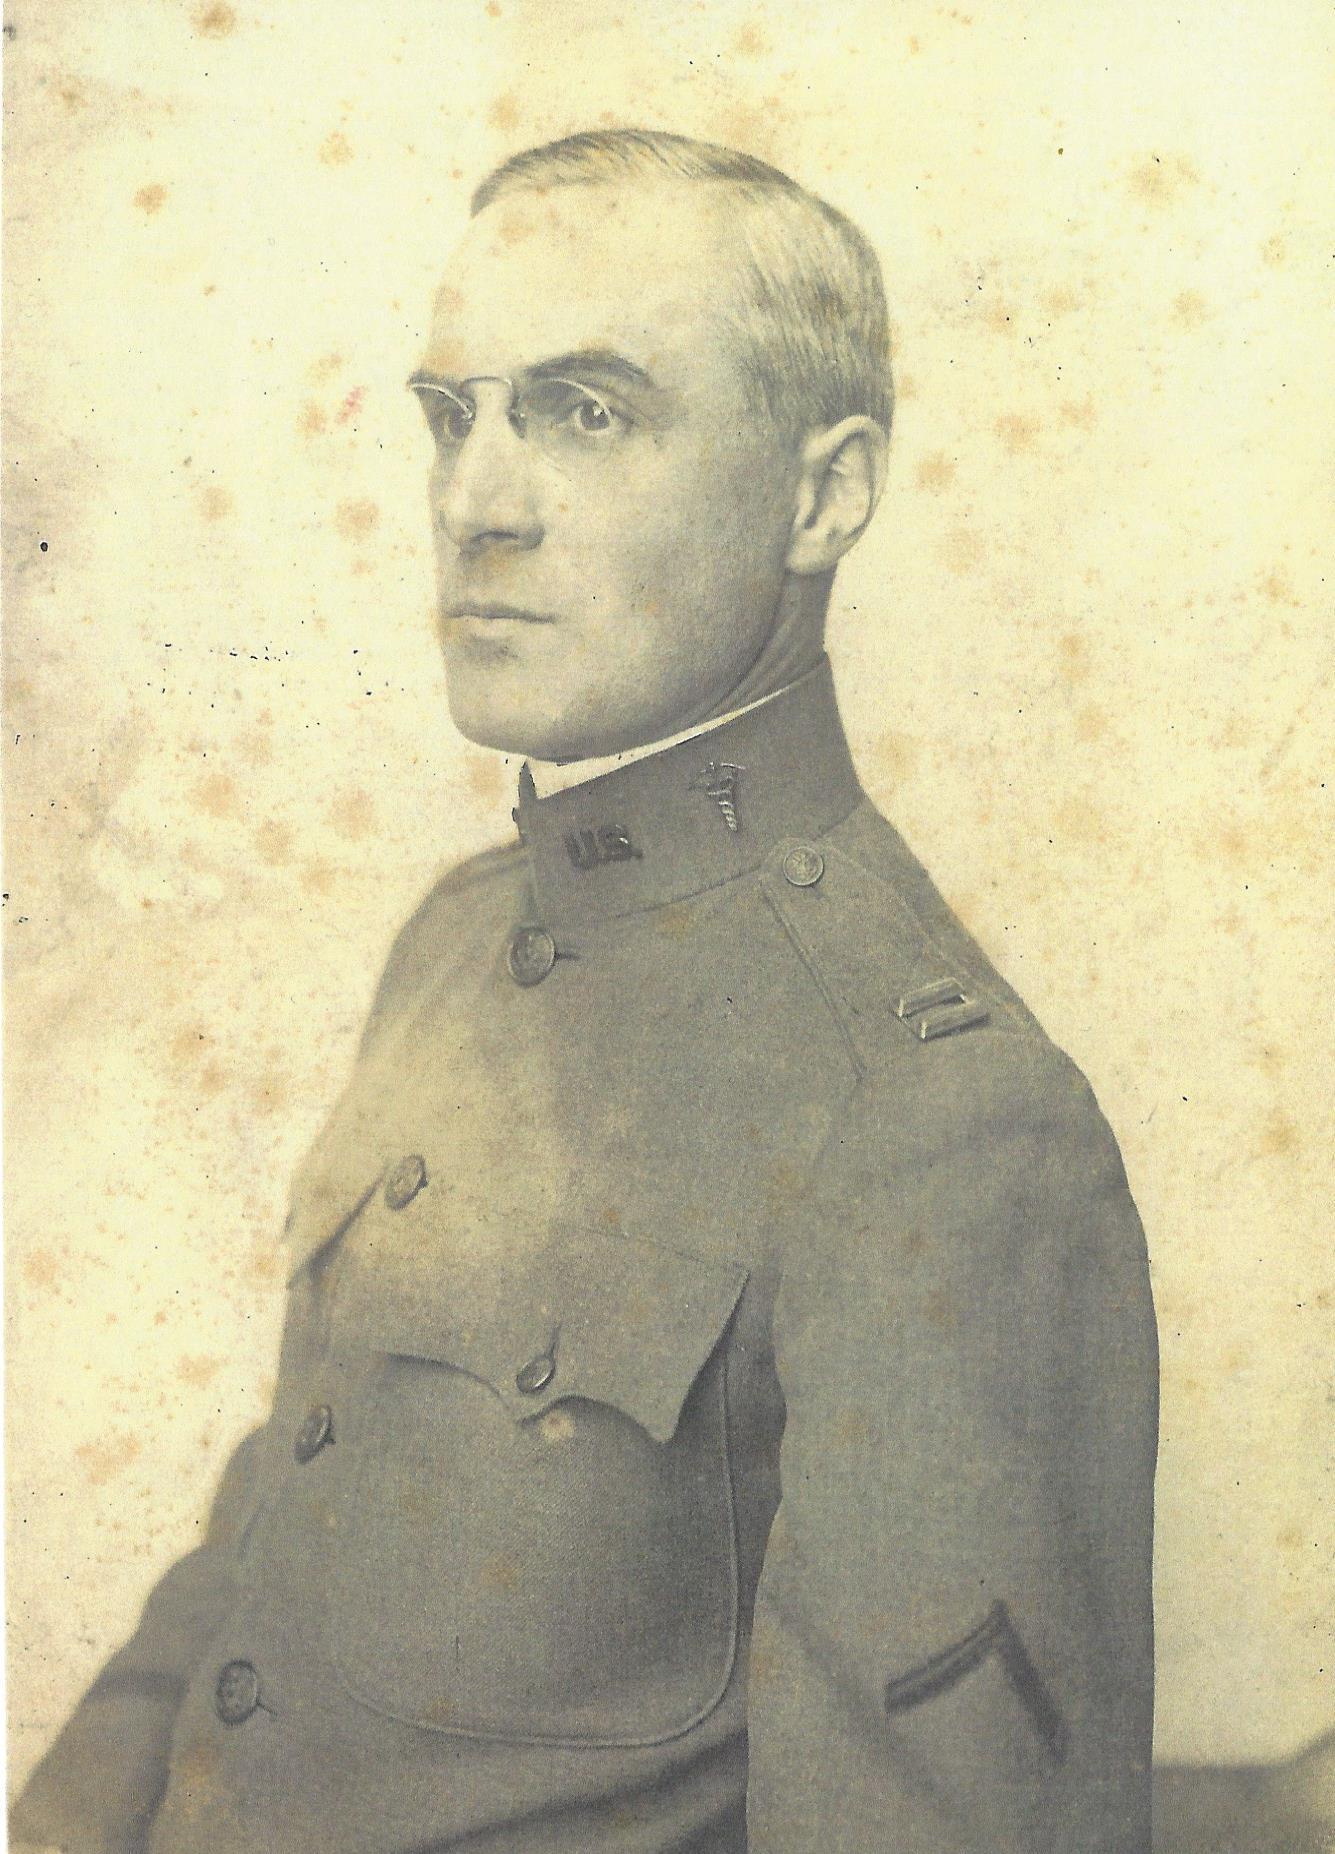 Major James Wyckoff, M.D. circa 1918 -